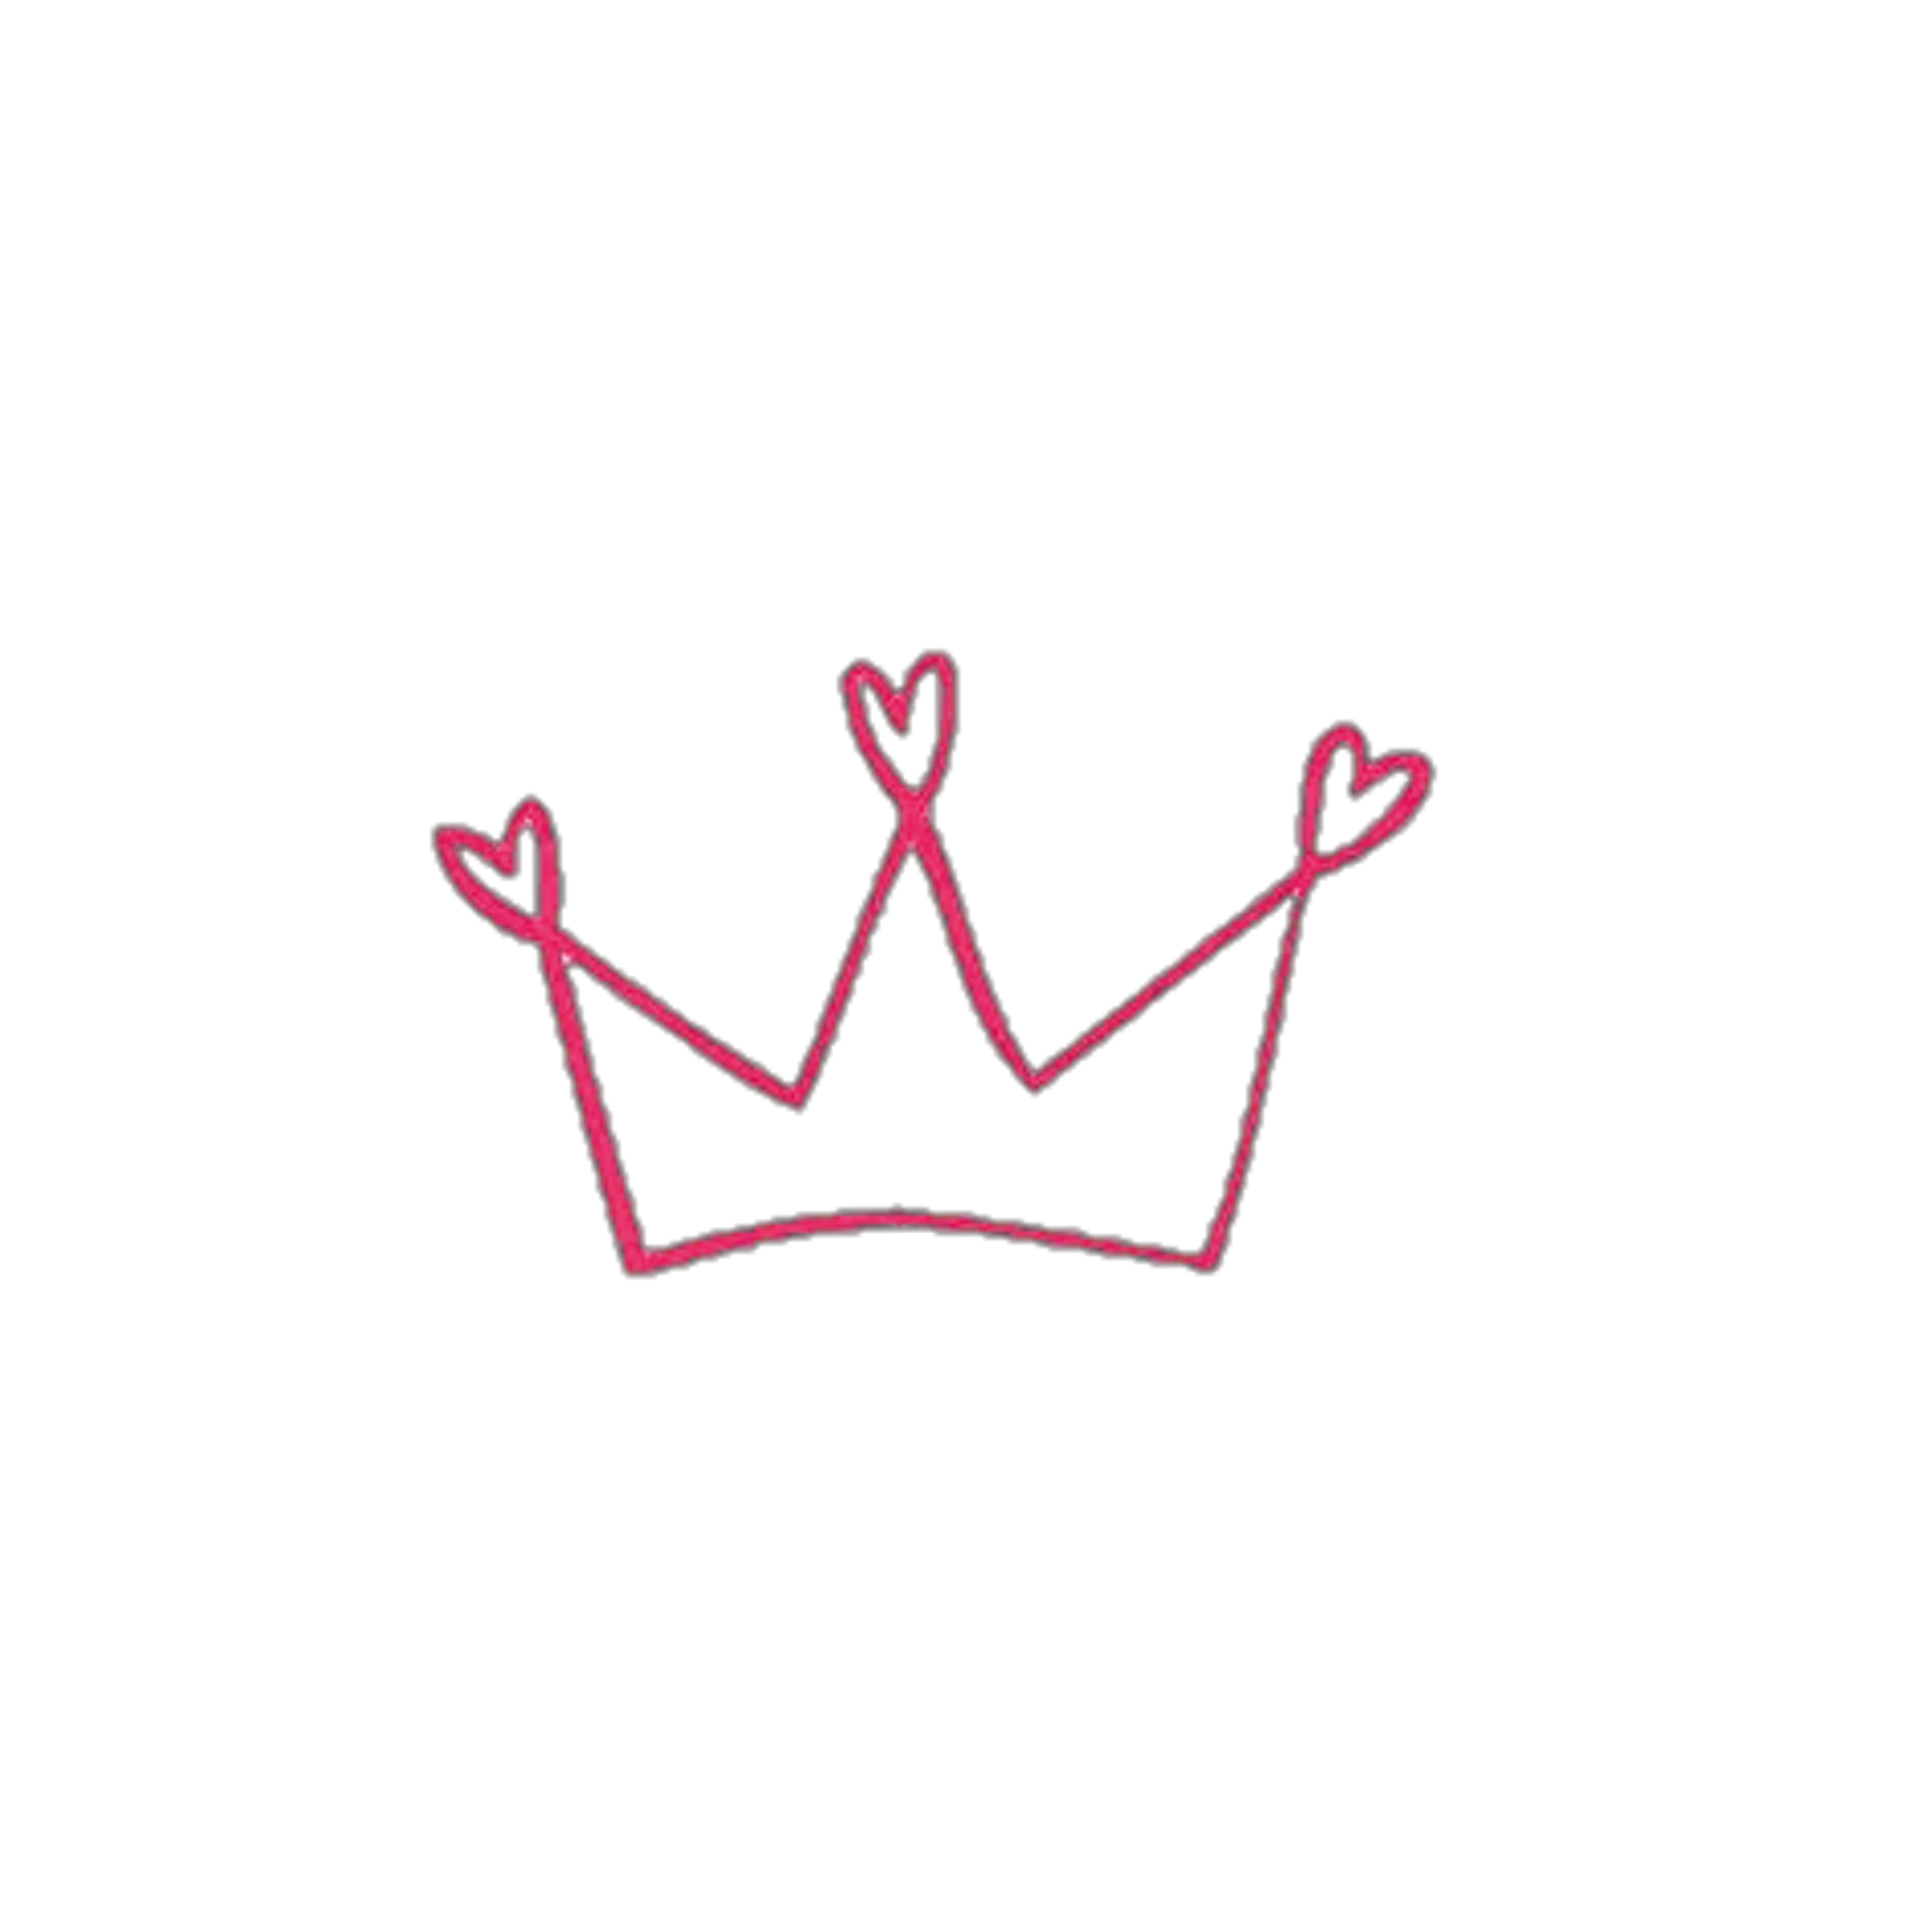 Freetoedit Crown Tumblr Hearts Love Aesthetic Remixit Crown Aesthetic Crown Tumblr Free Clip Art